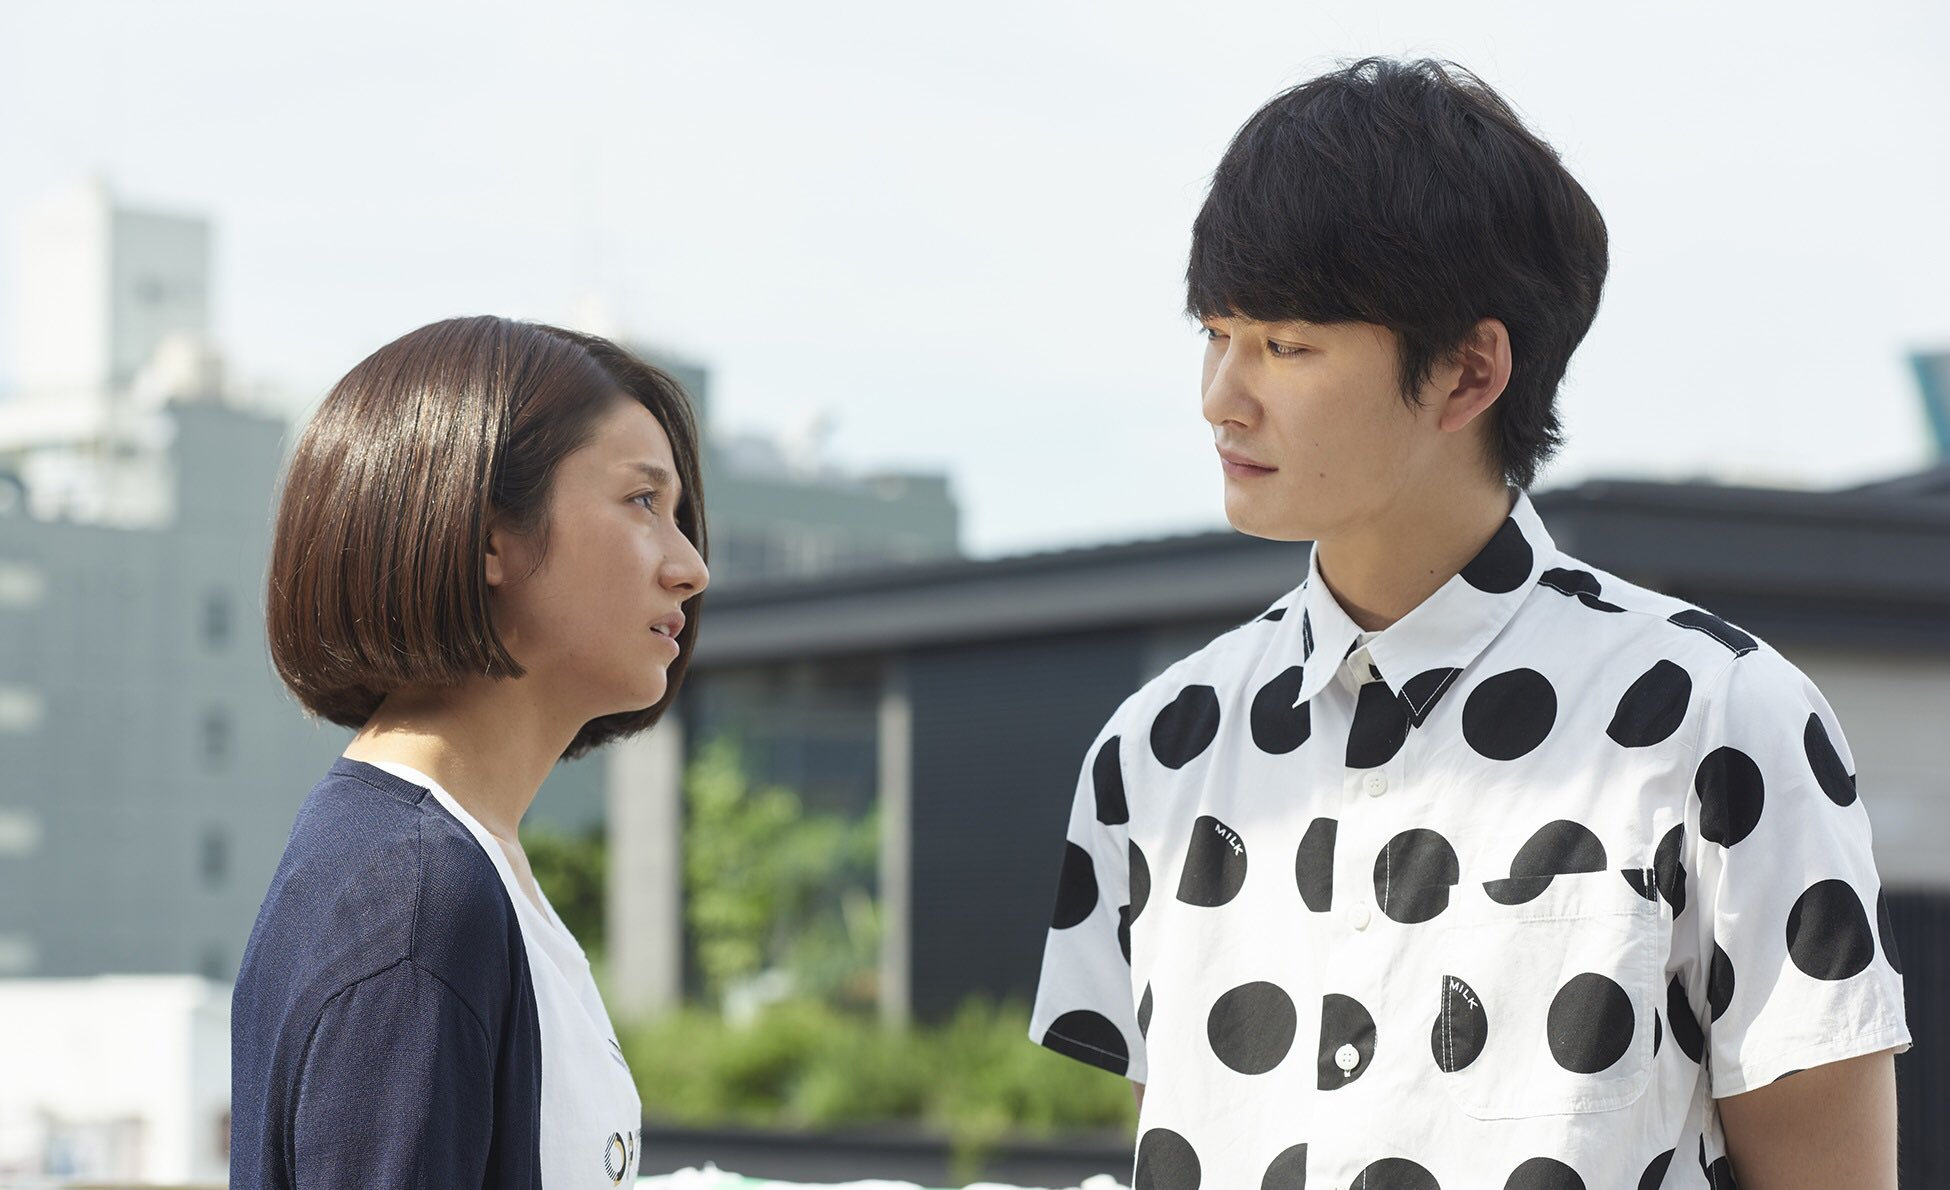 岡田将生出演の映画⑲